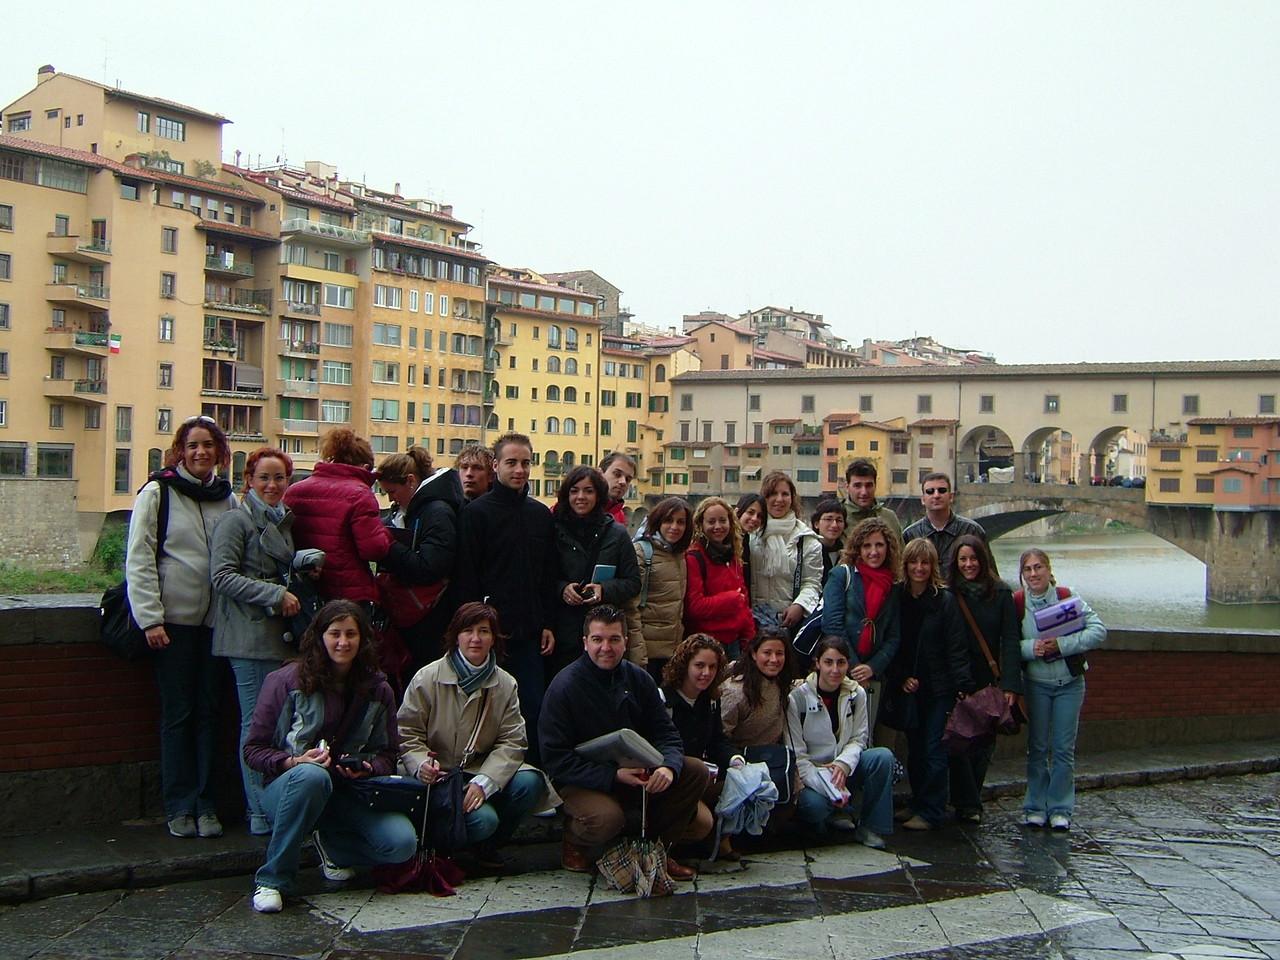 2003 Ponte vecchio. Florencia